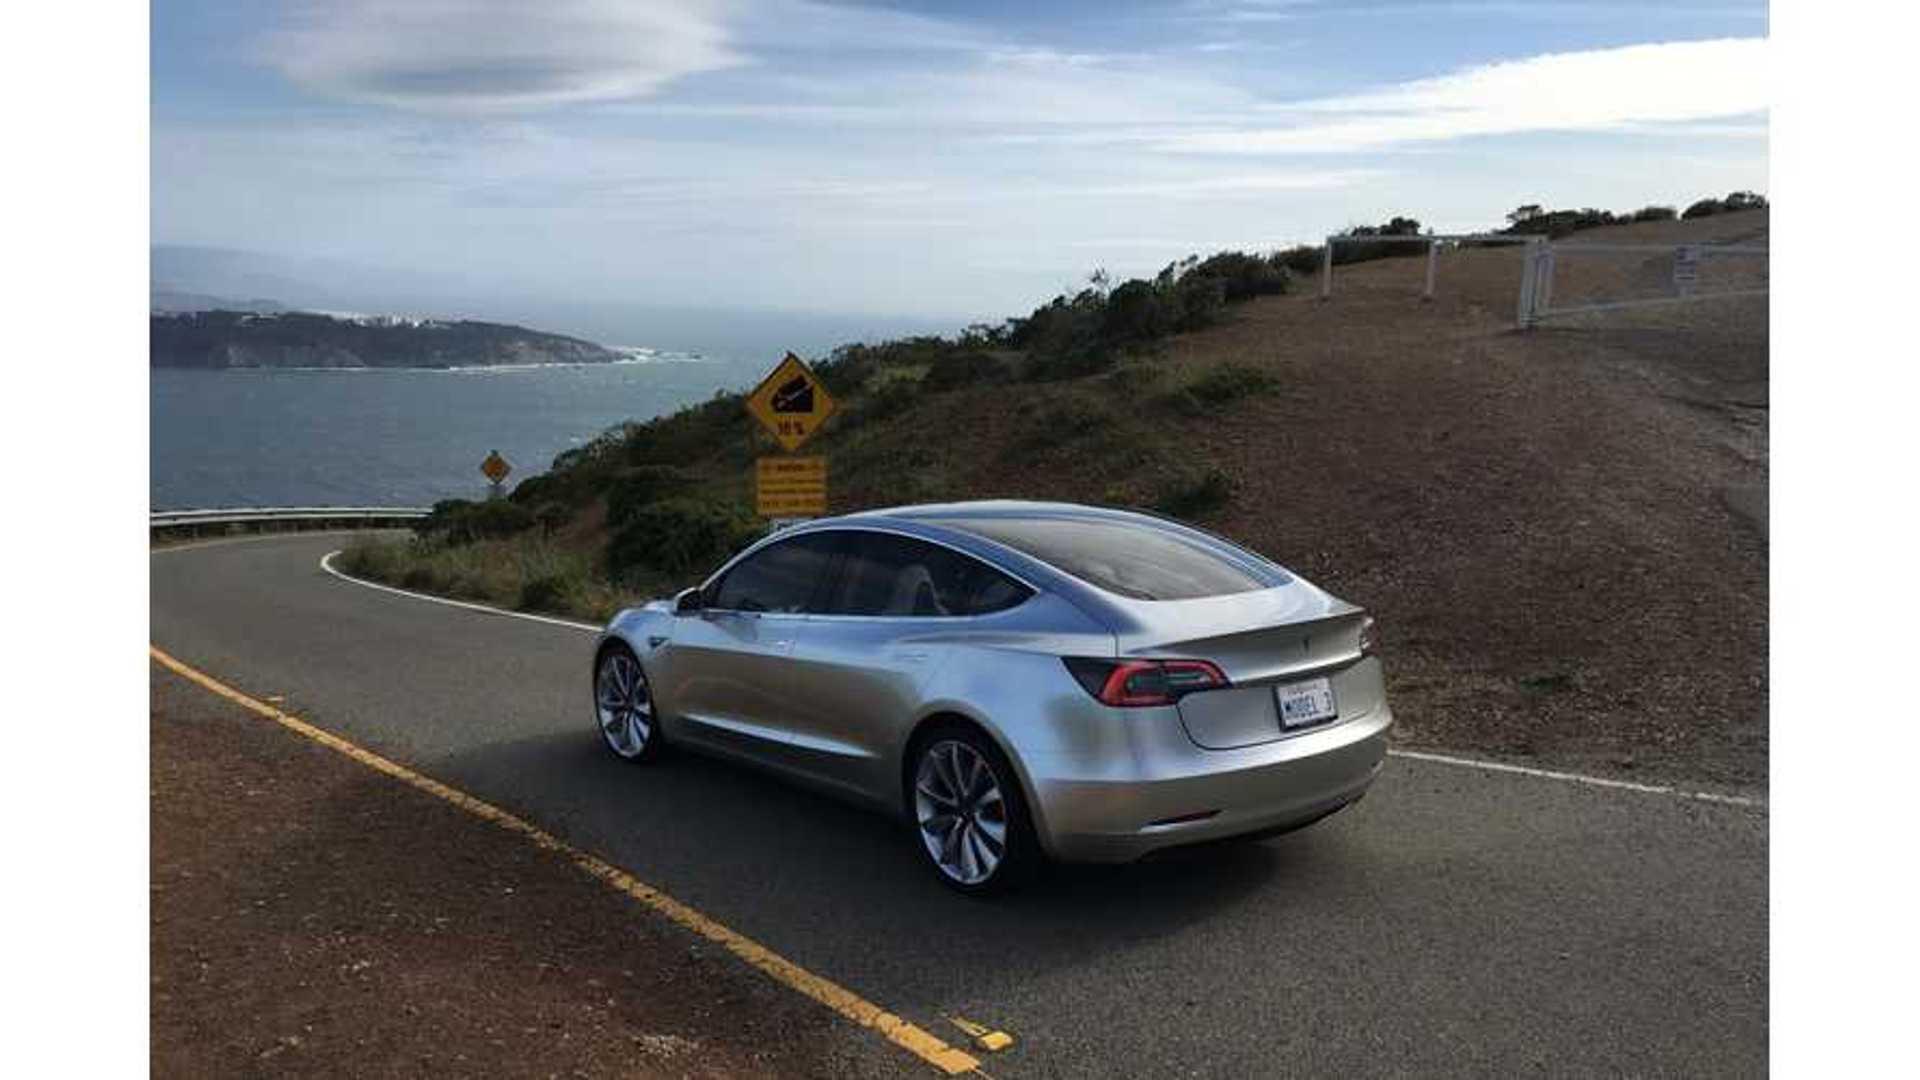 Most Tesla Model 3 Reservation Holders Want Non-Base Version